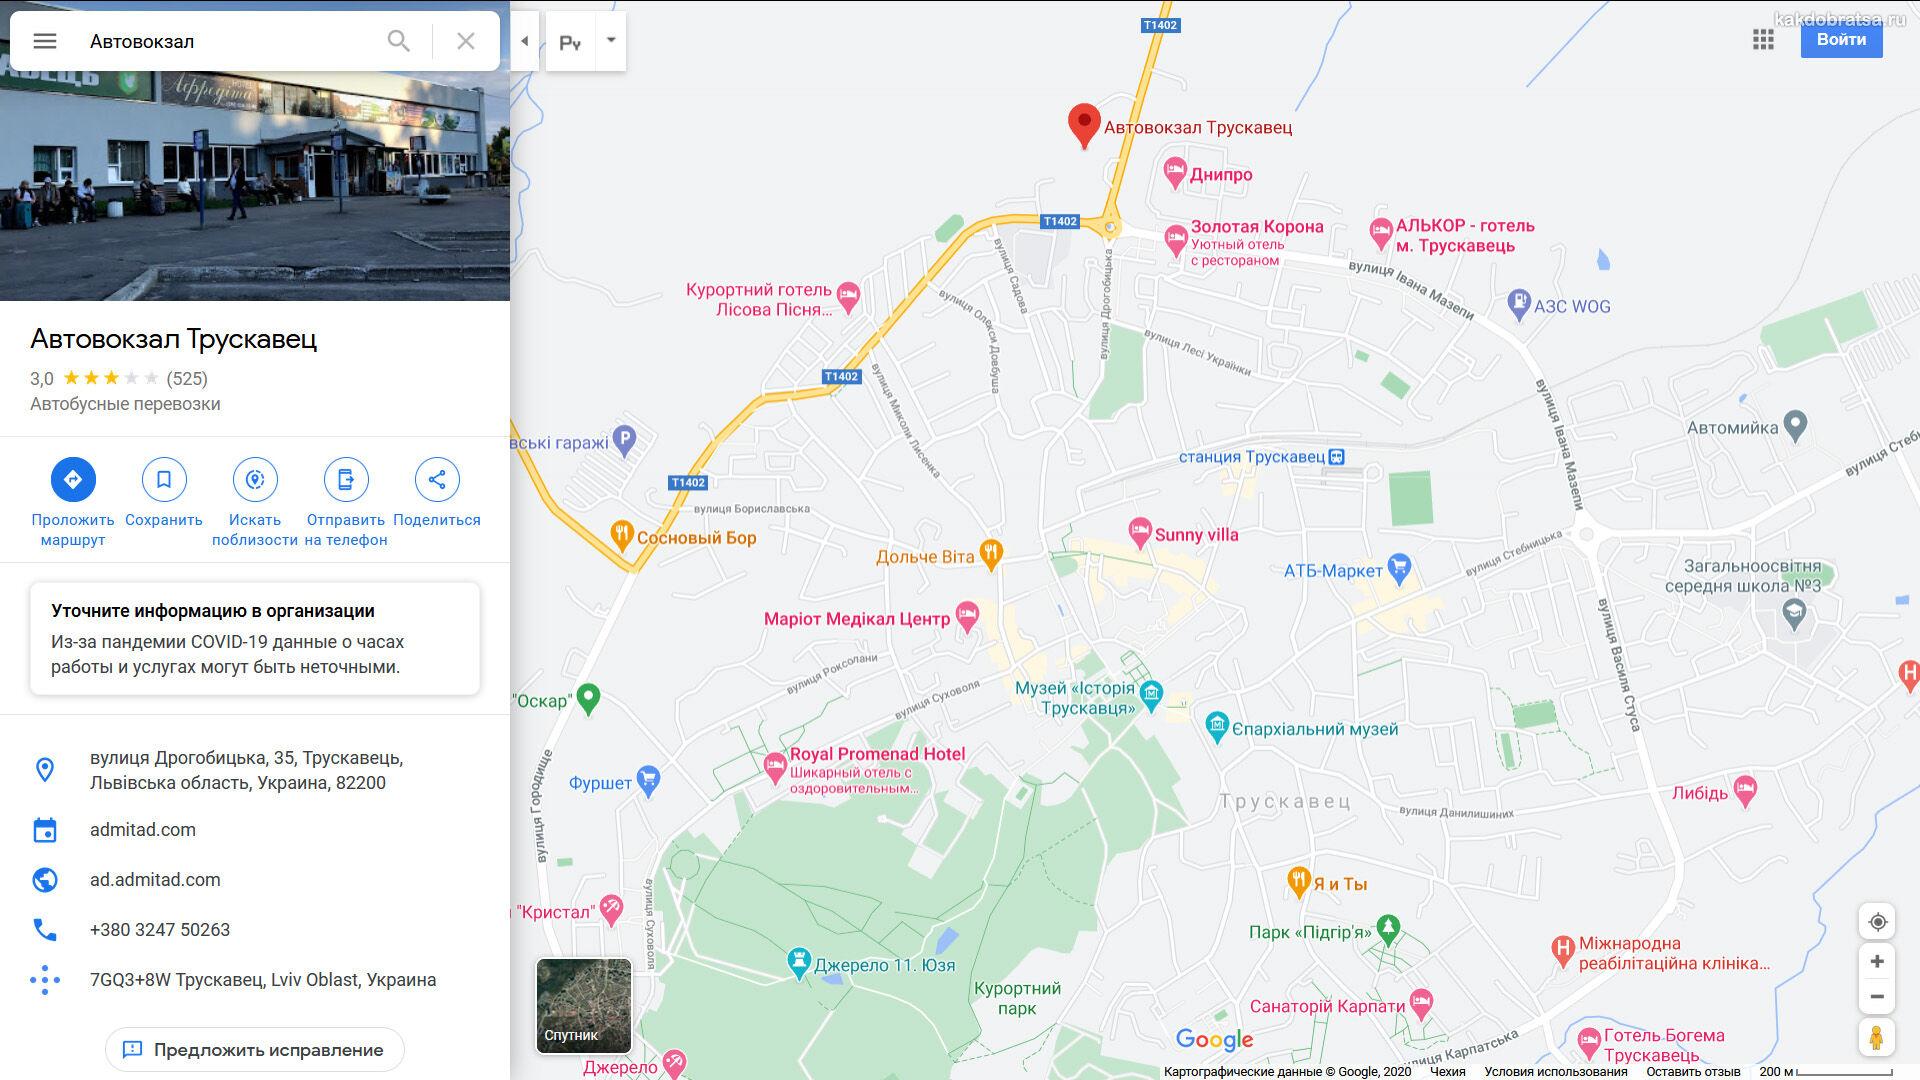 Автовокзал Трускавец на карте и адрес